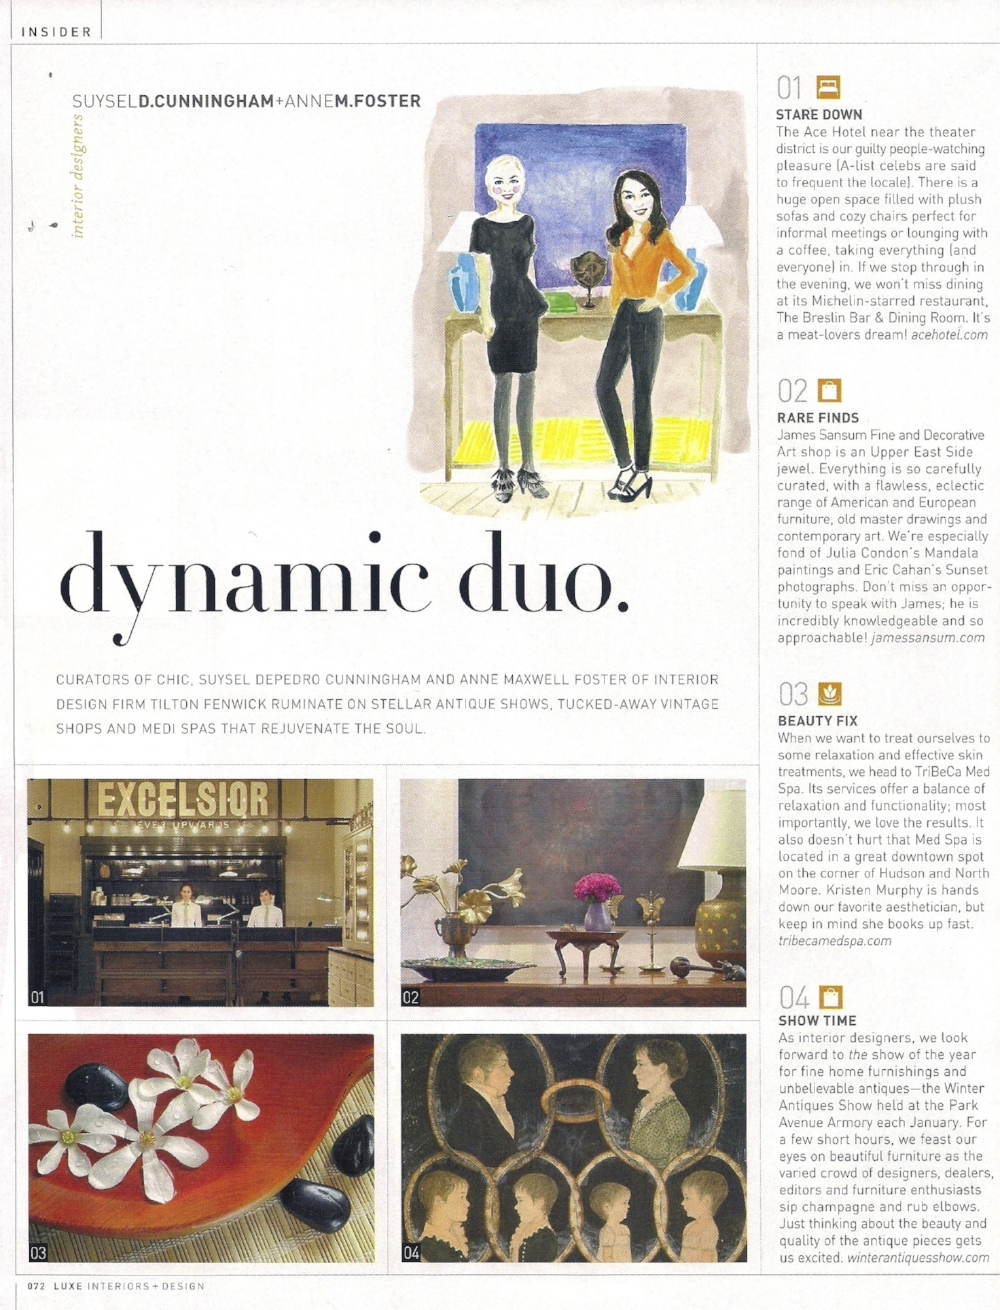 8.LuxeMagazine_Winter2012_p72_TiltonFenwick.jpg